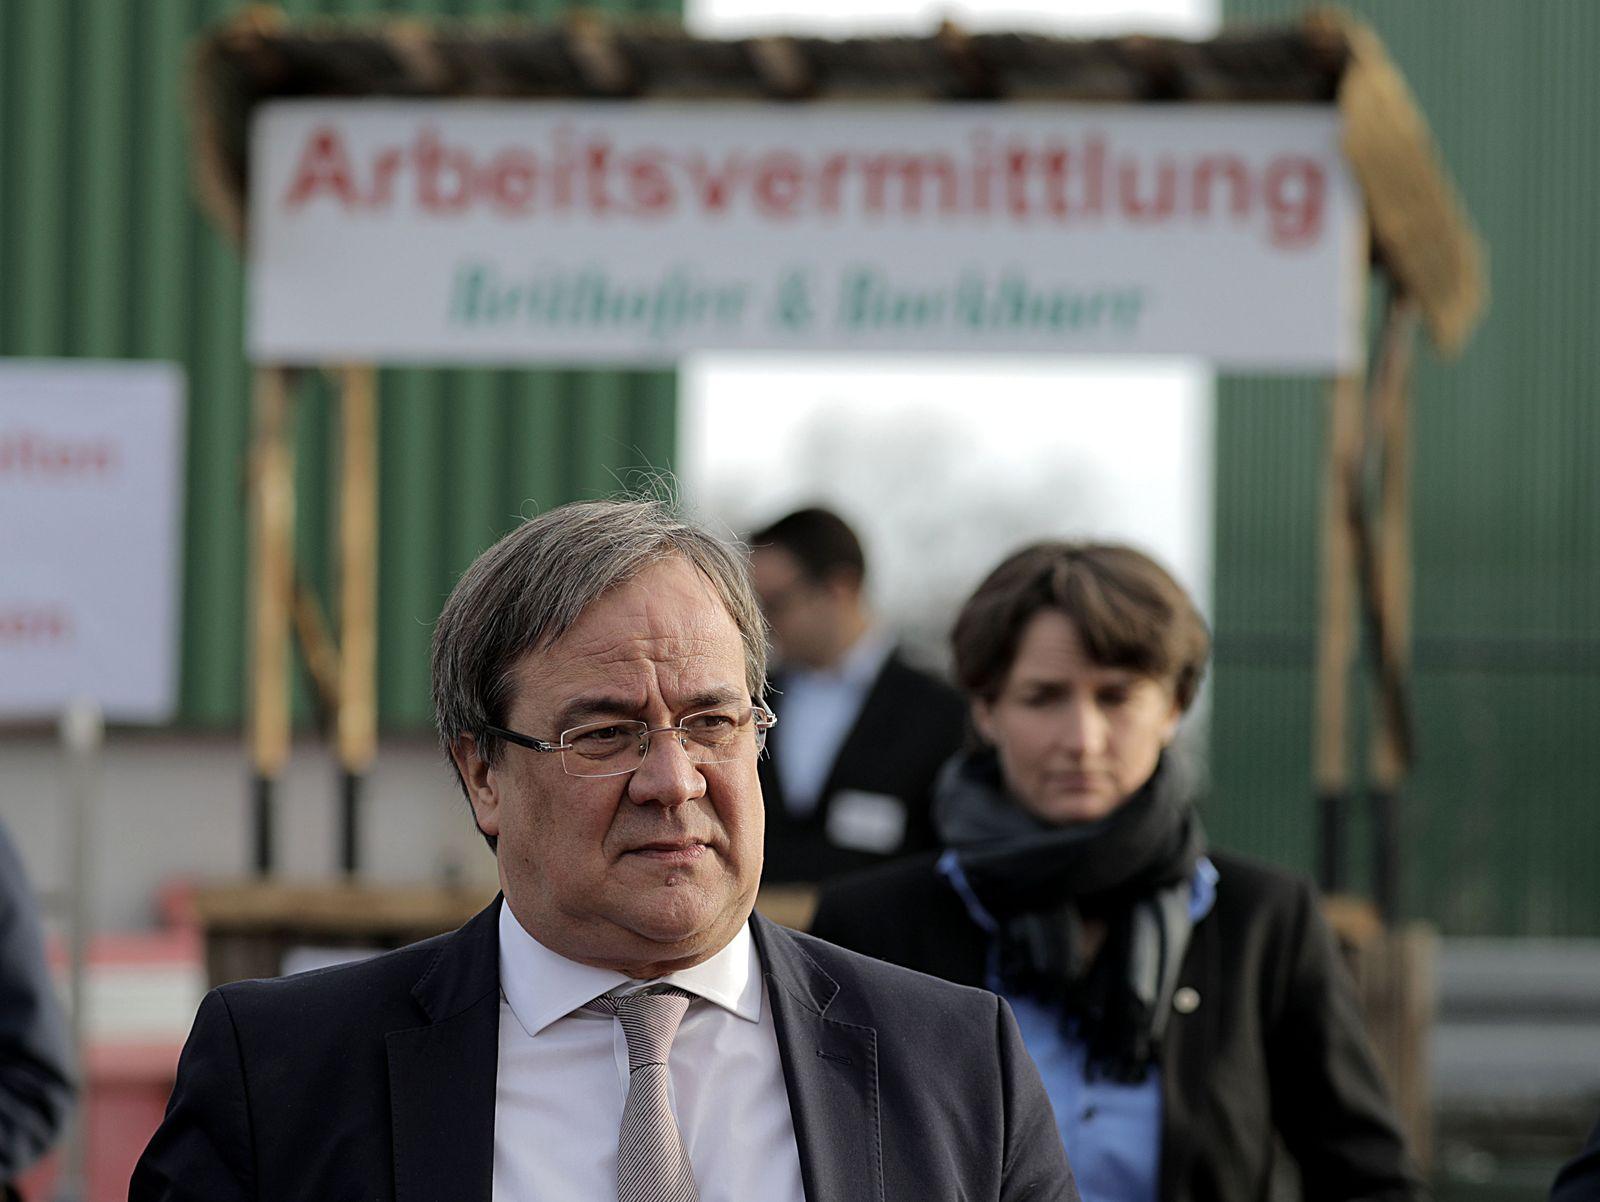 Betriebsversammlung RWE Hambach